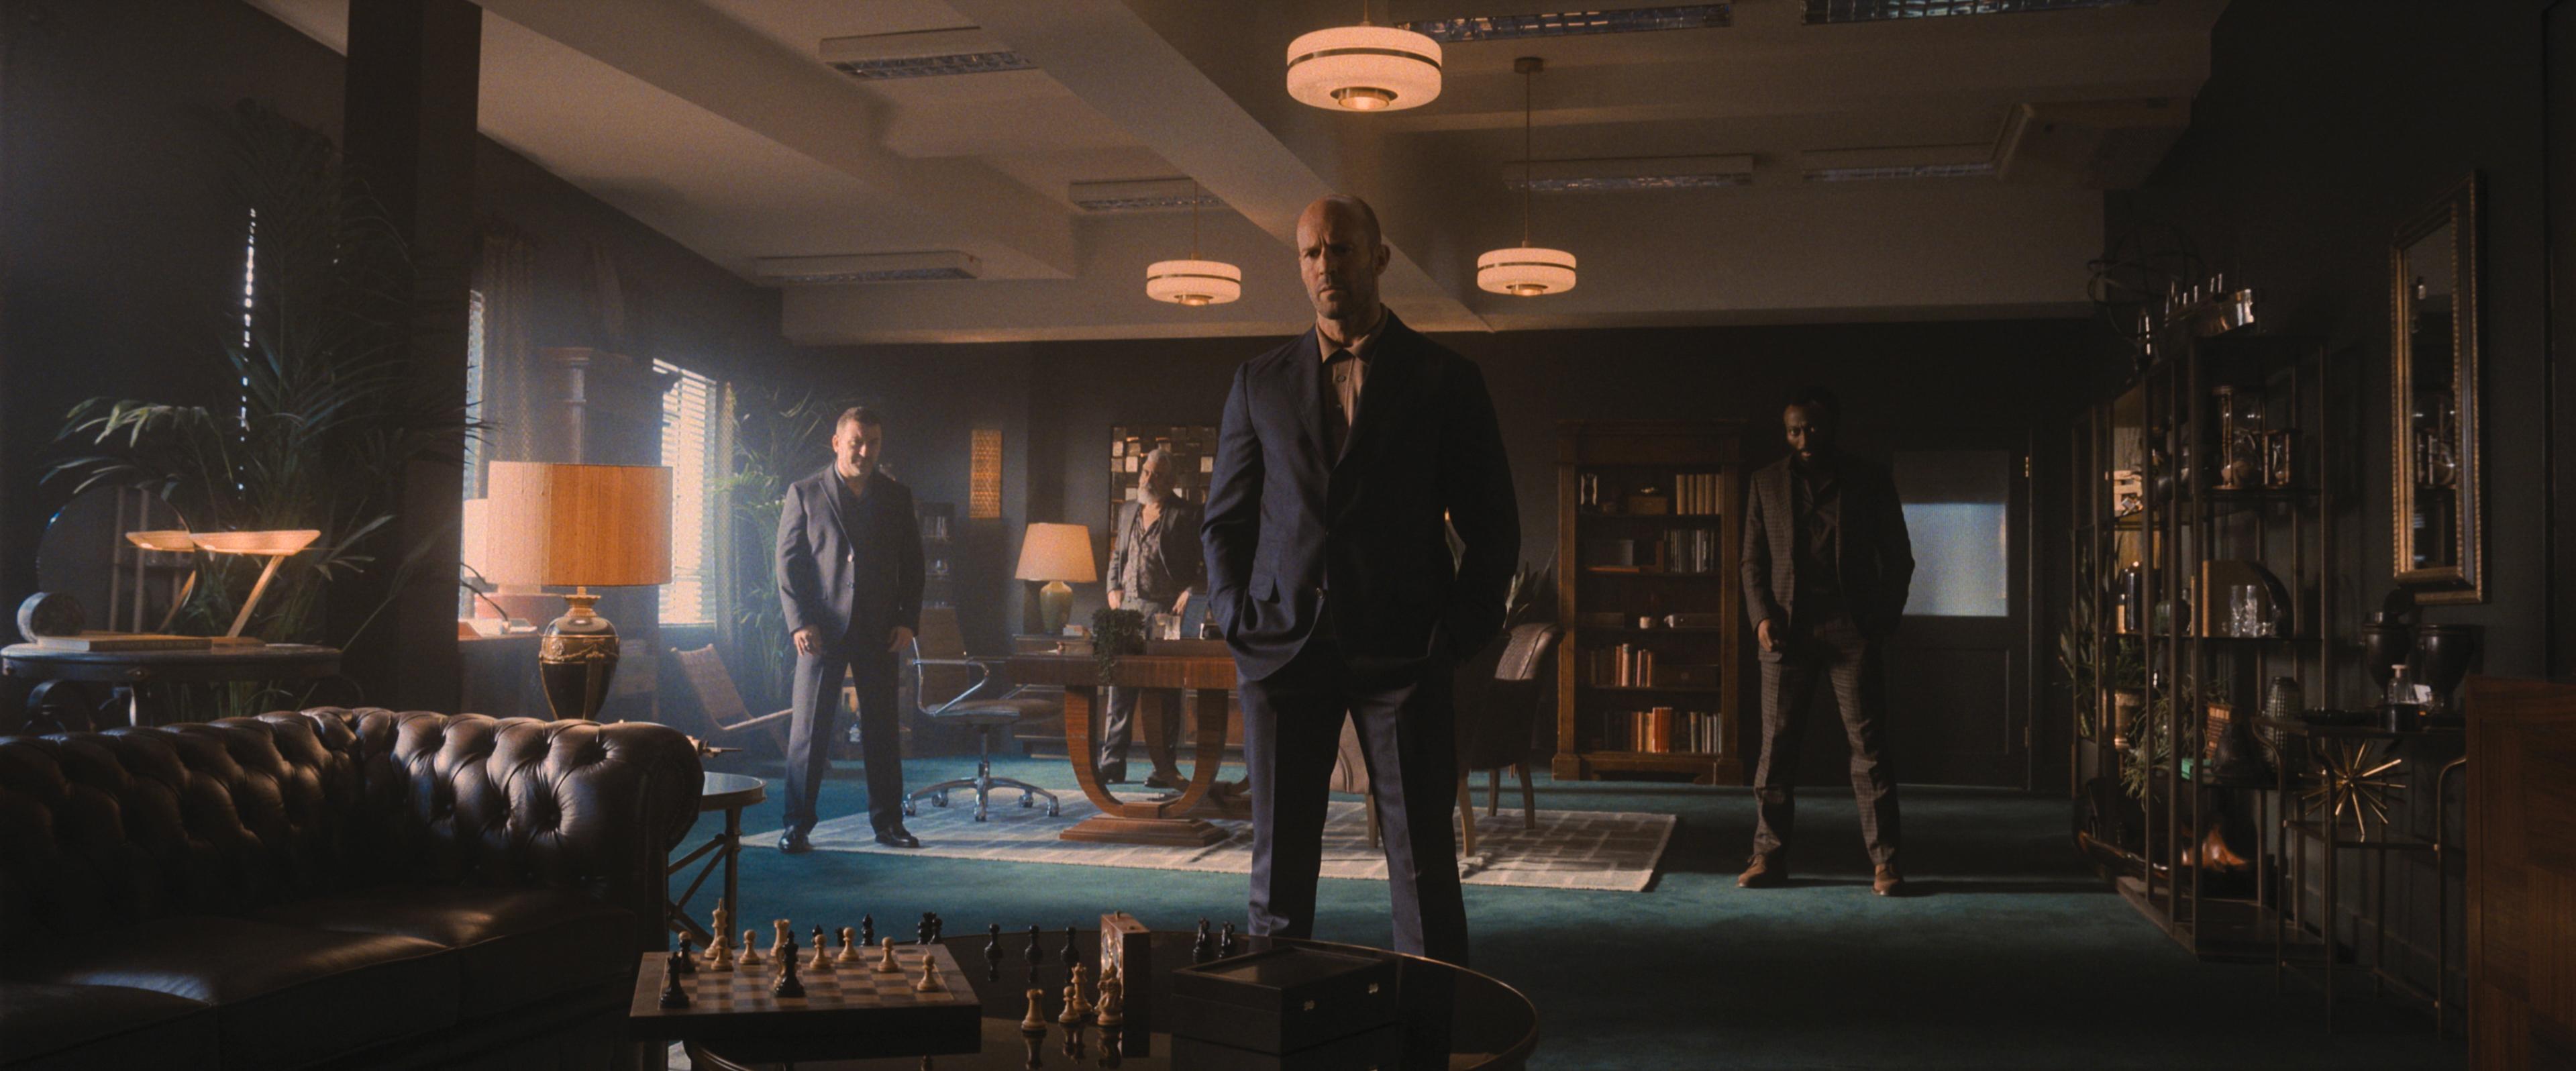 Jason Statham, Darrell D'Silva, Cameron Jack, and Babs Olusanmokun in Wrath of Man (2021)